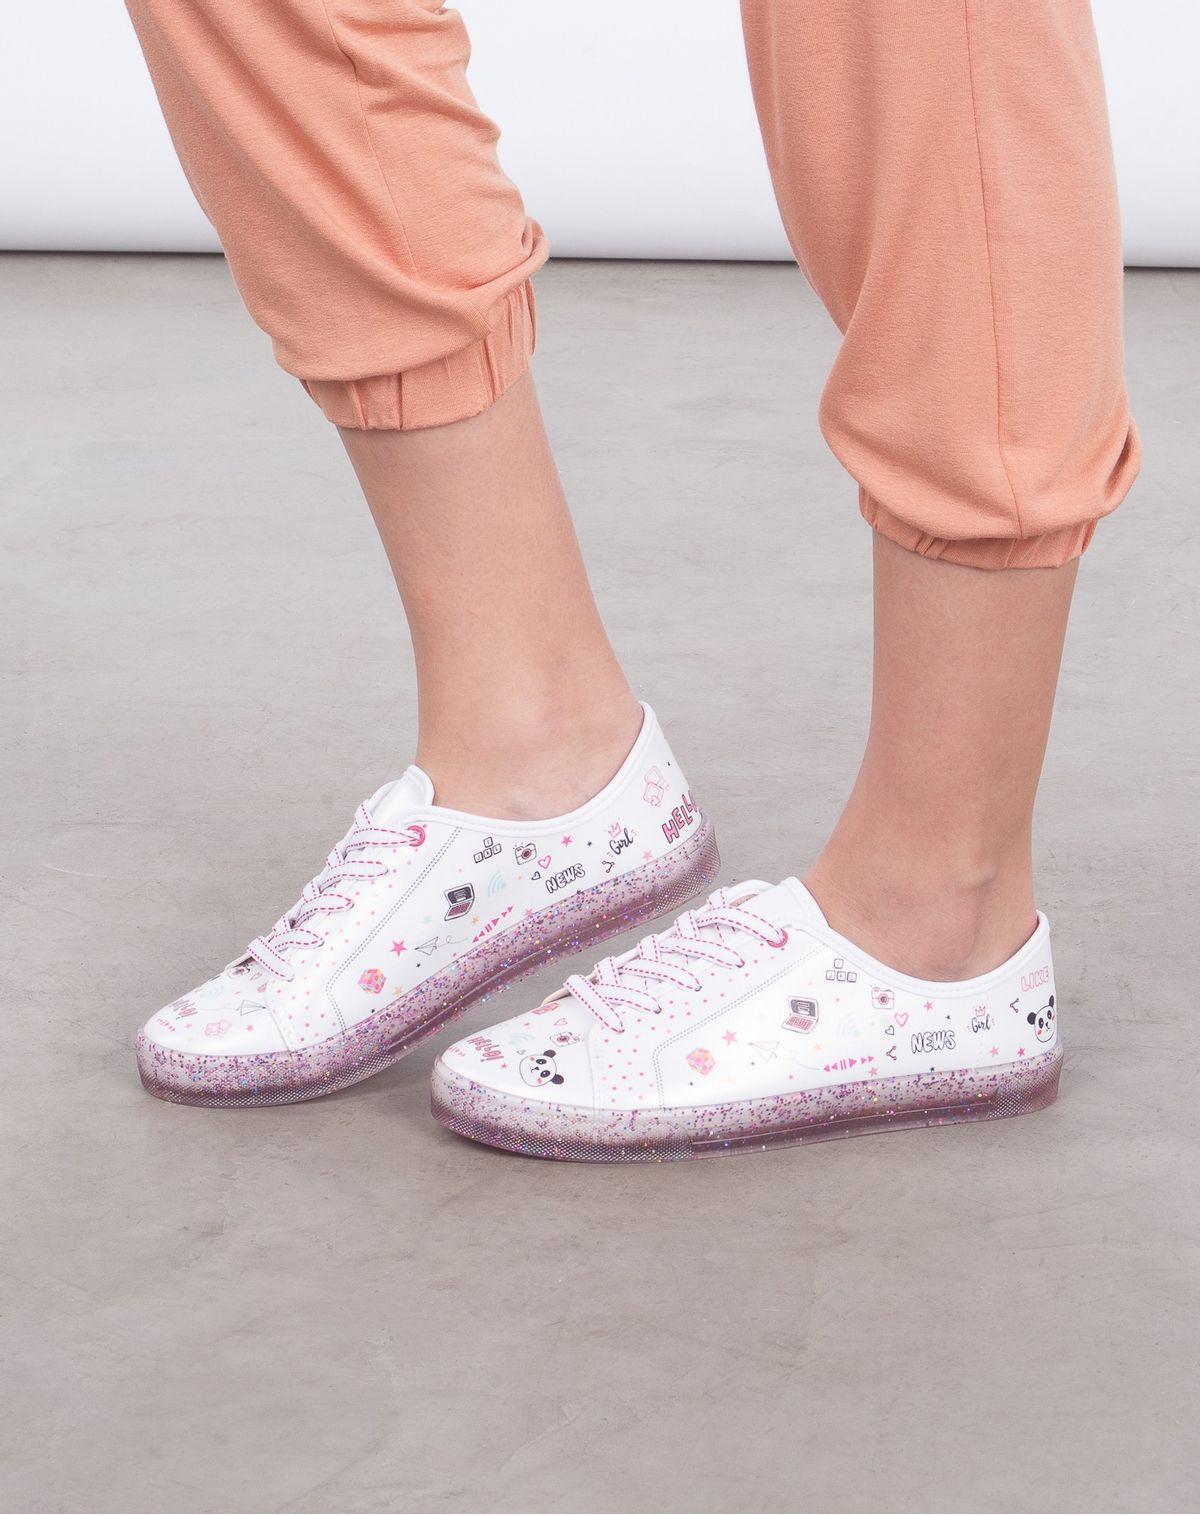 2050005633329-Tenis-Glitter-Infantil-Menina-Estampa-Divertida-Molekinha-BRANCO-31-1